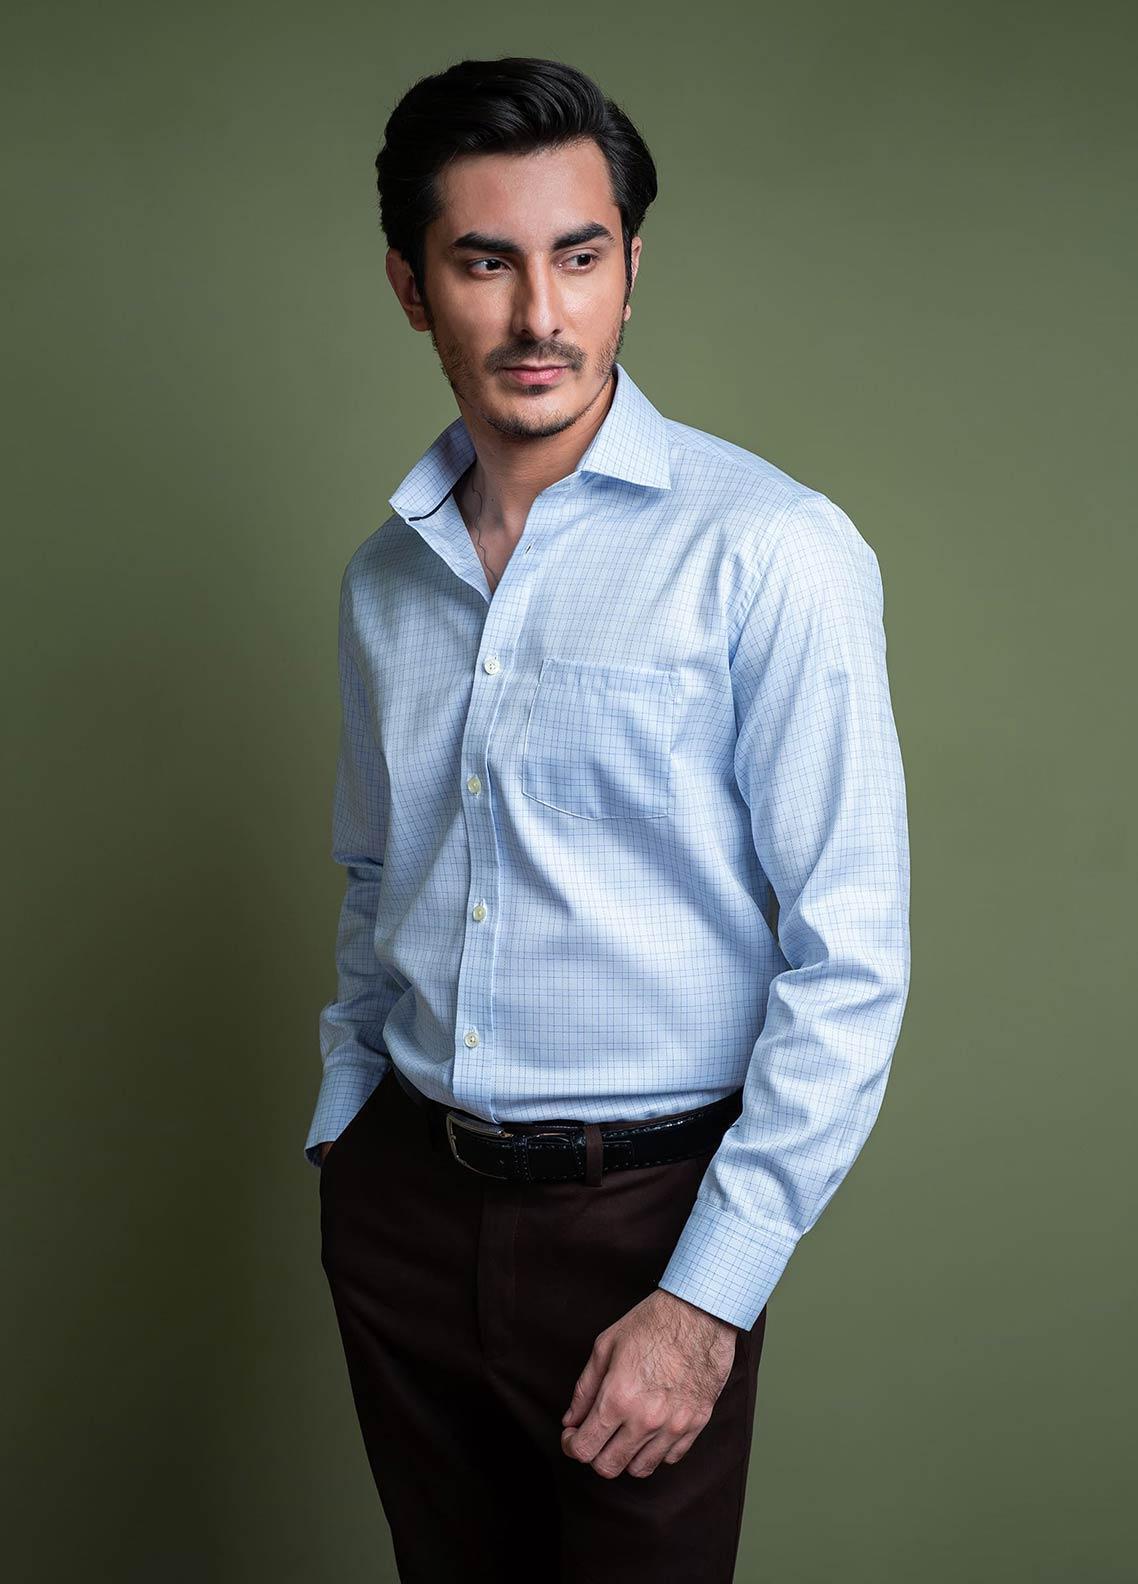 Brumano Cotton Formal Shirts for Men -  BM20SH Sky Blue Formal Check Shirt With Cutaway Collar